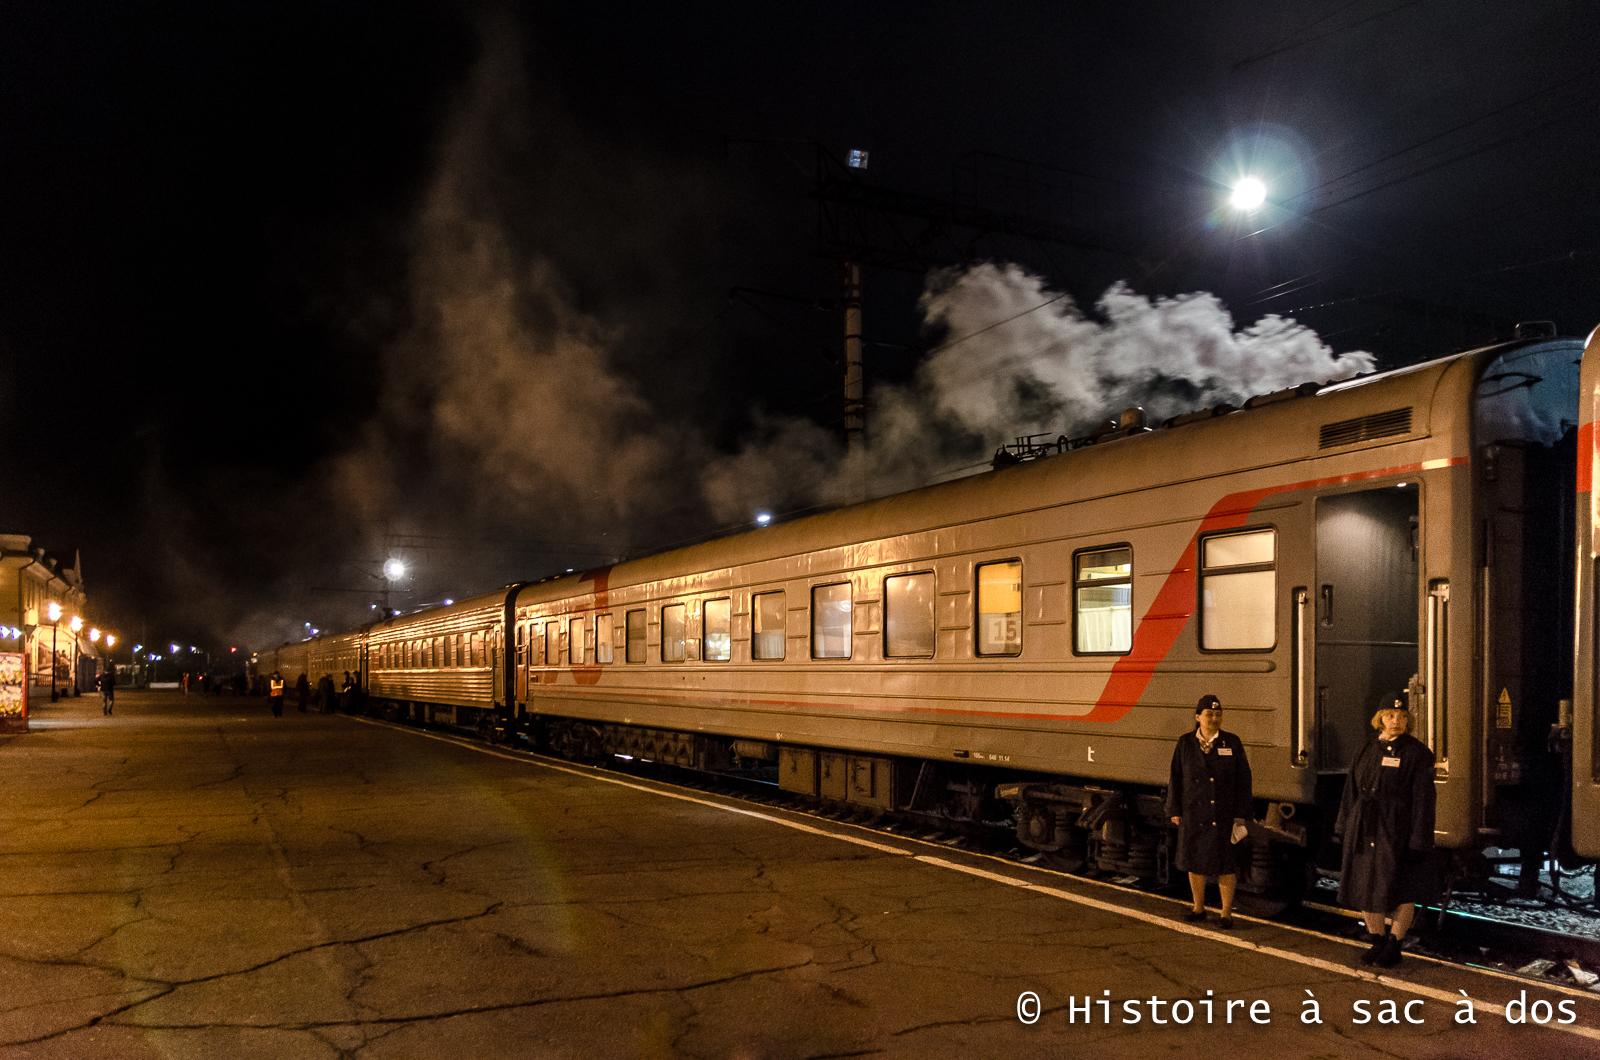 Transsibérien - Station d'Oulan-Ude, capitale de la Bouriatie en Sibérie Orientale.